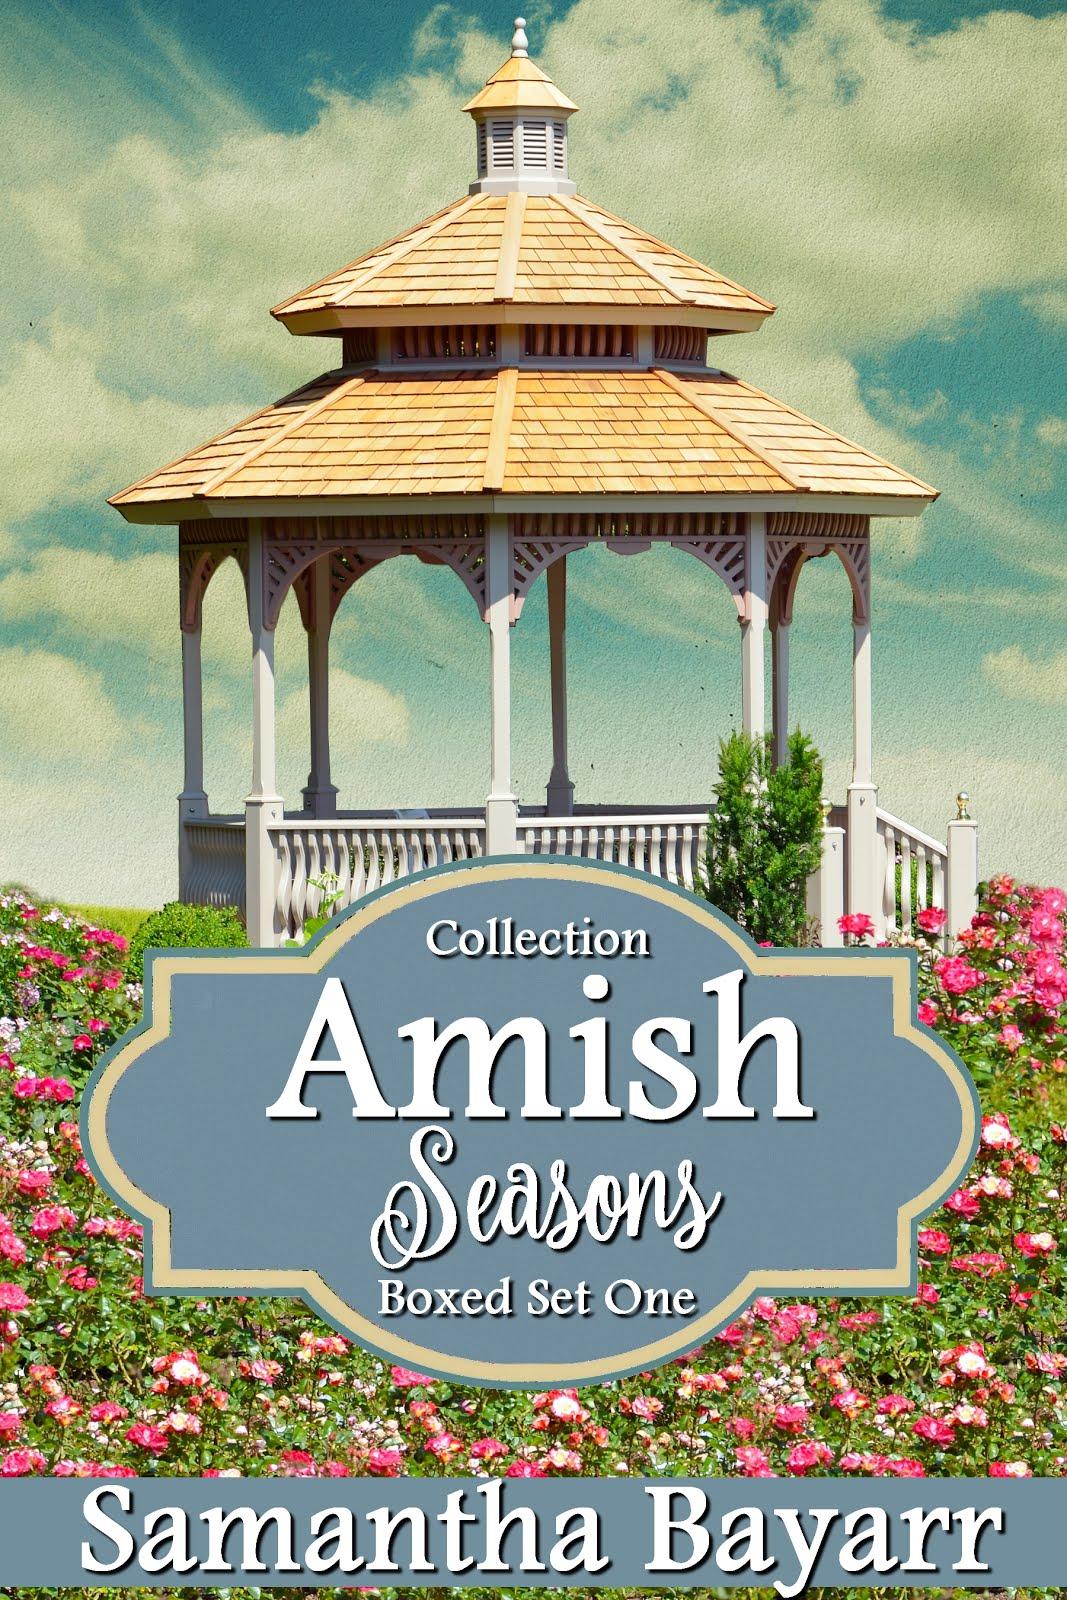 Amish Season Collection